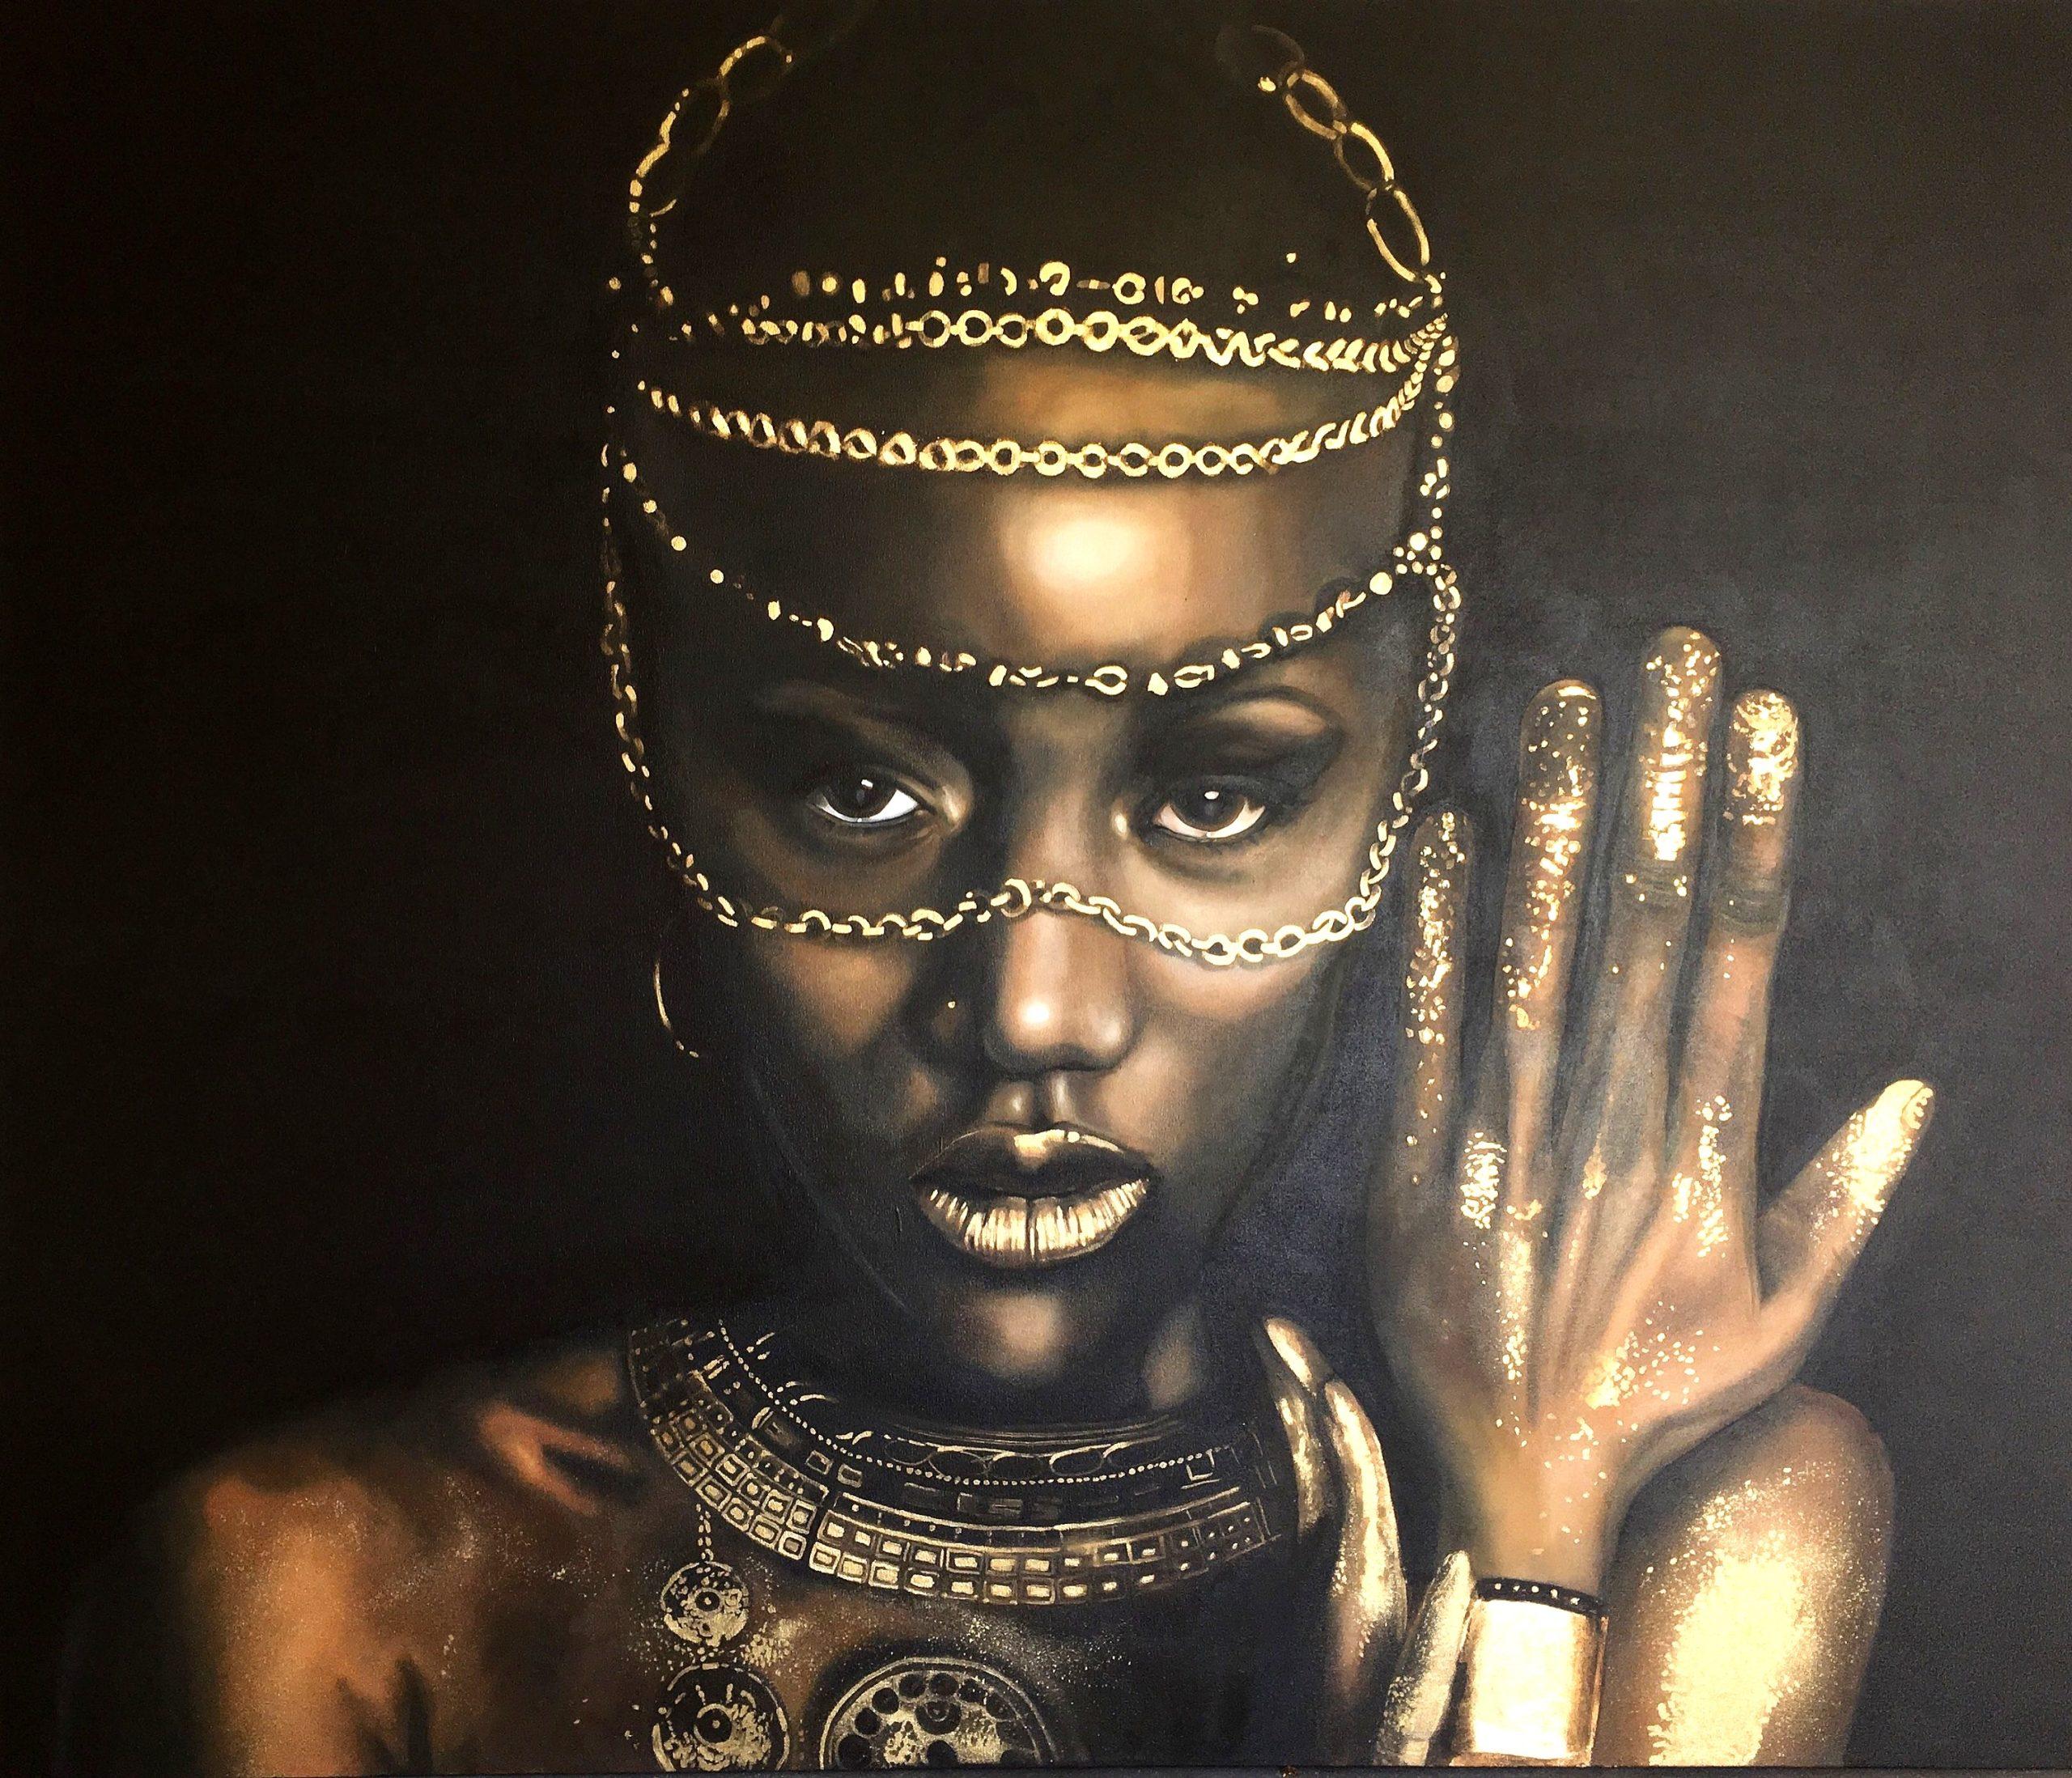 Vicky Sanders Realistic - African Queen